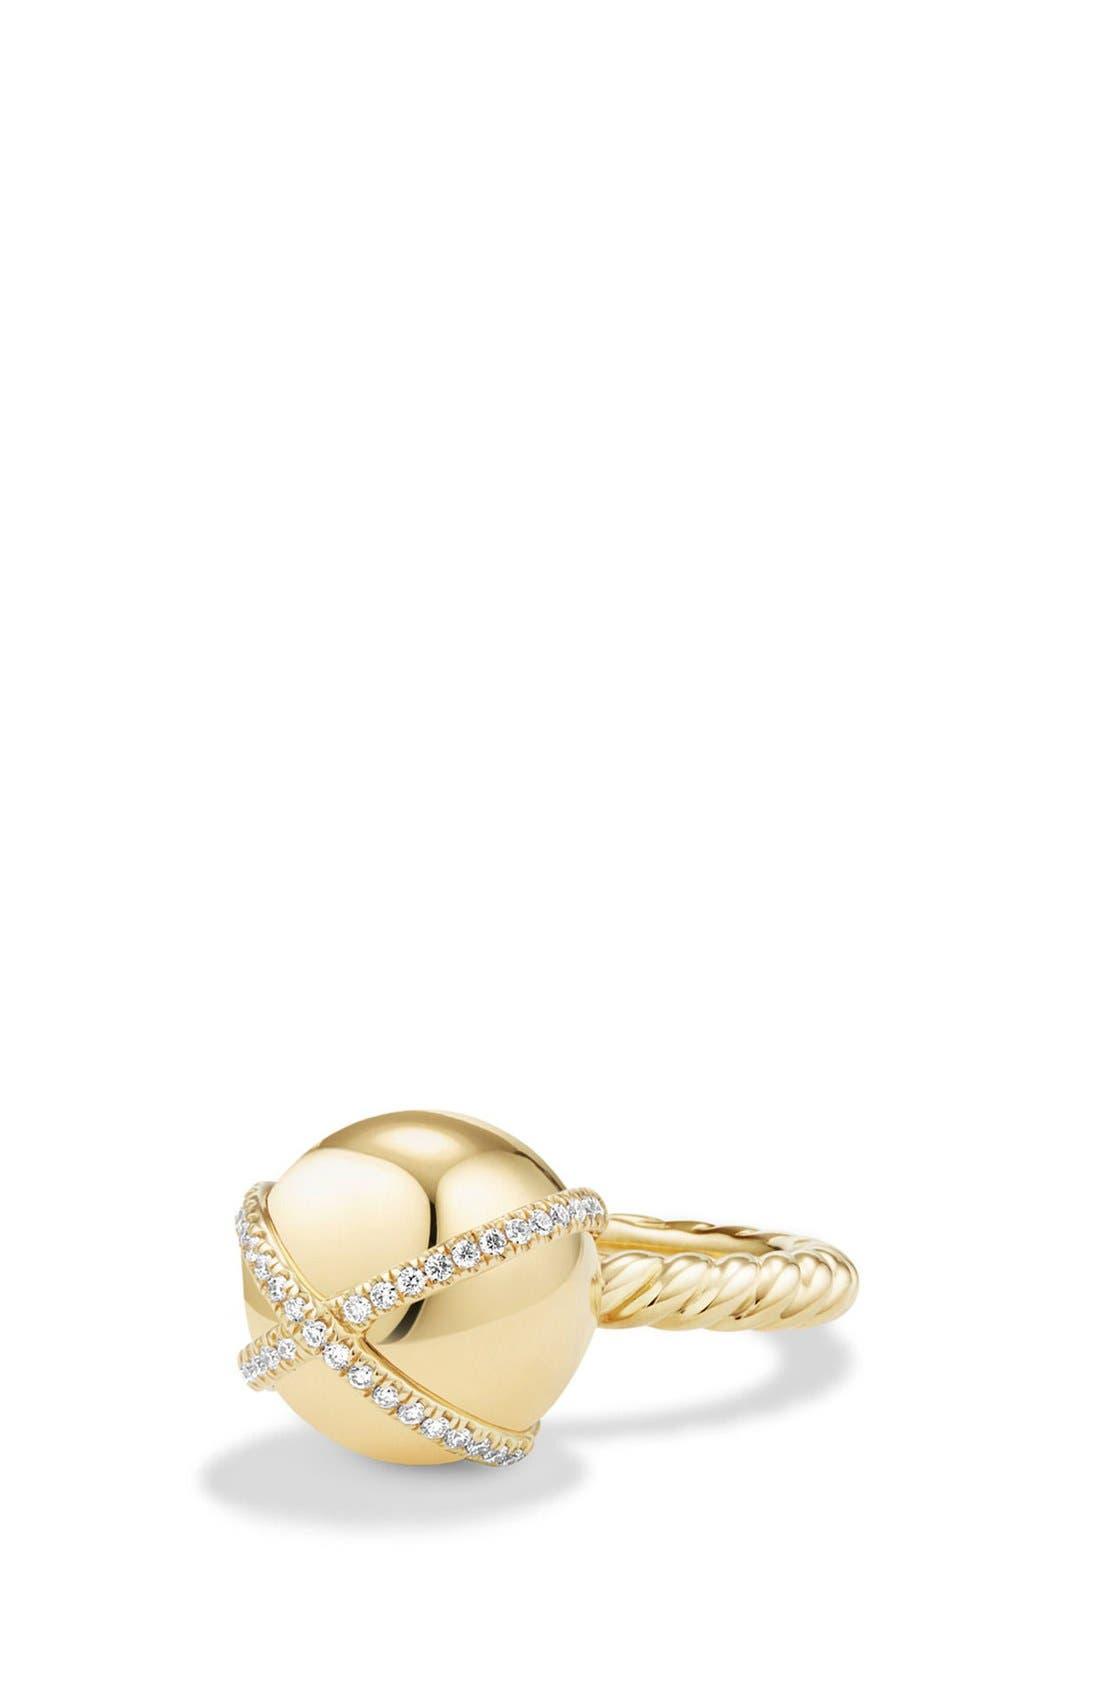 Main Image - David Yurman 'Solari' Wrap Ring with Pavé Diamonds in 18k Gold